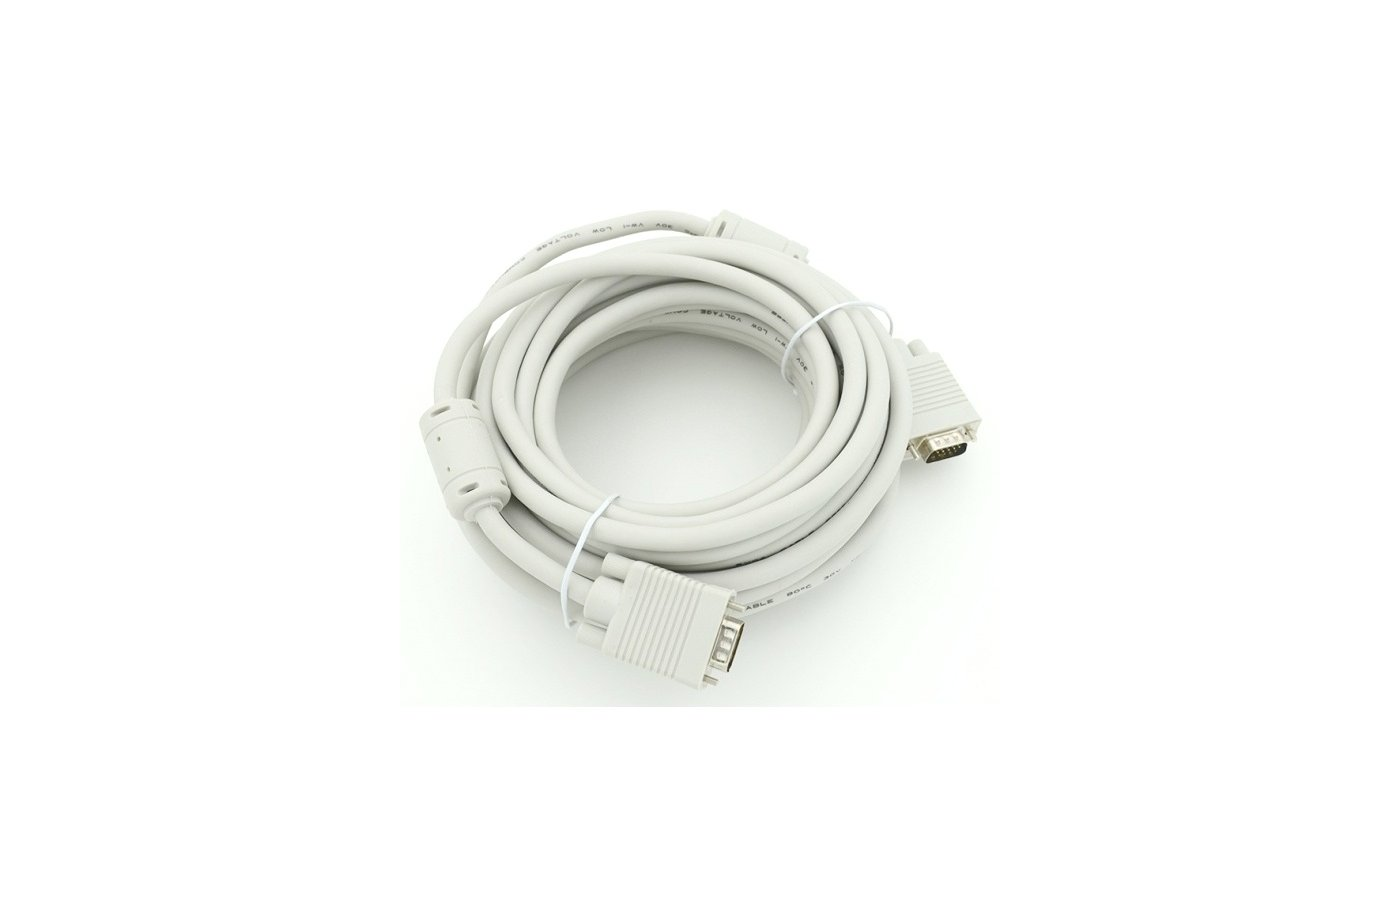 Видео кабель Кабель VGA(m) - VGA(m) 2 filters 10м (675562)